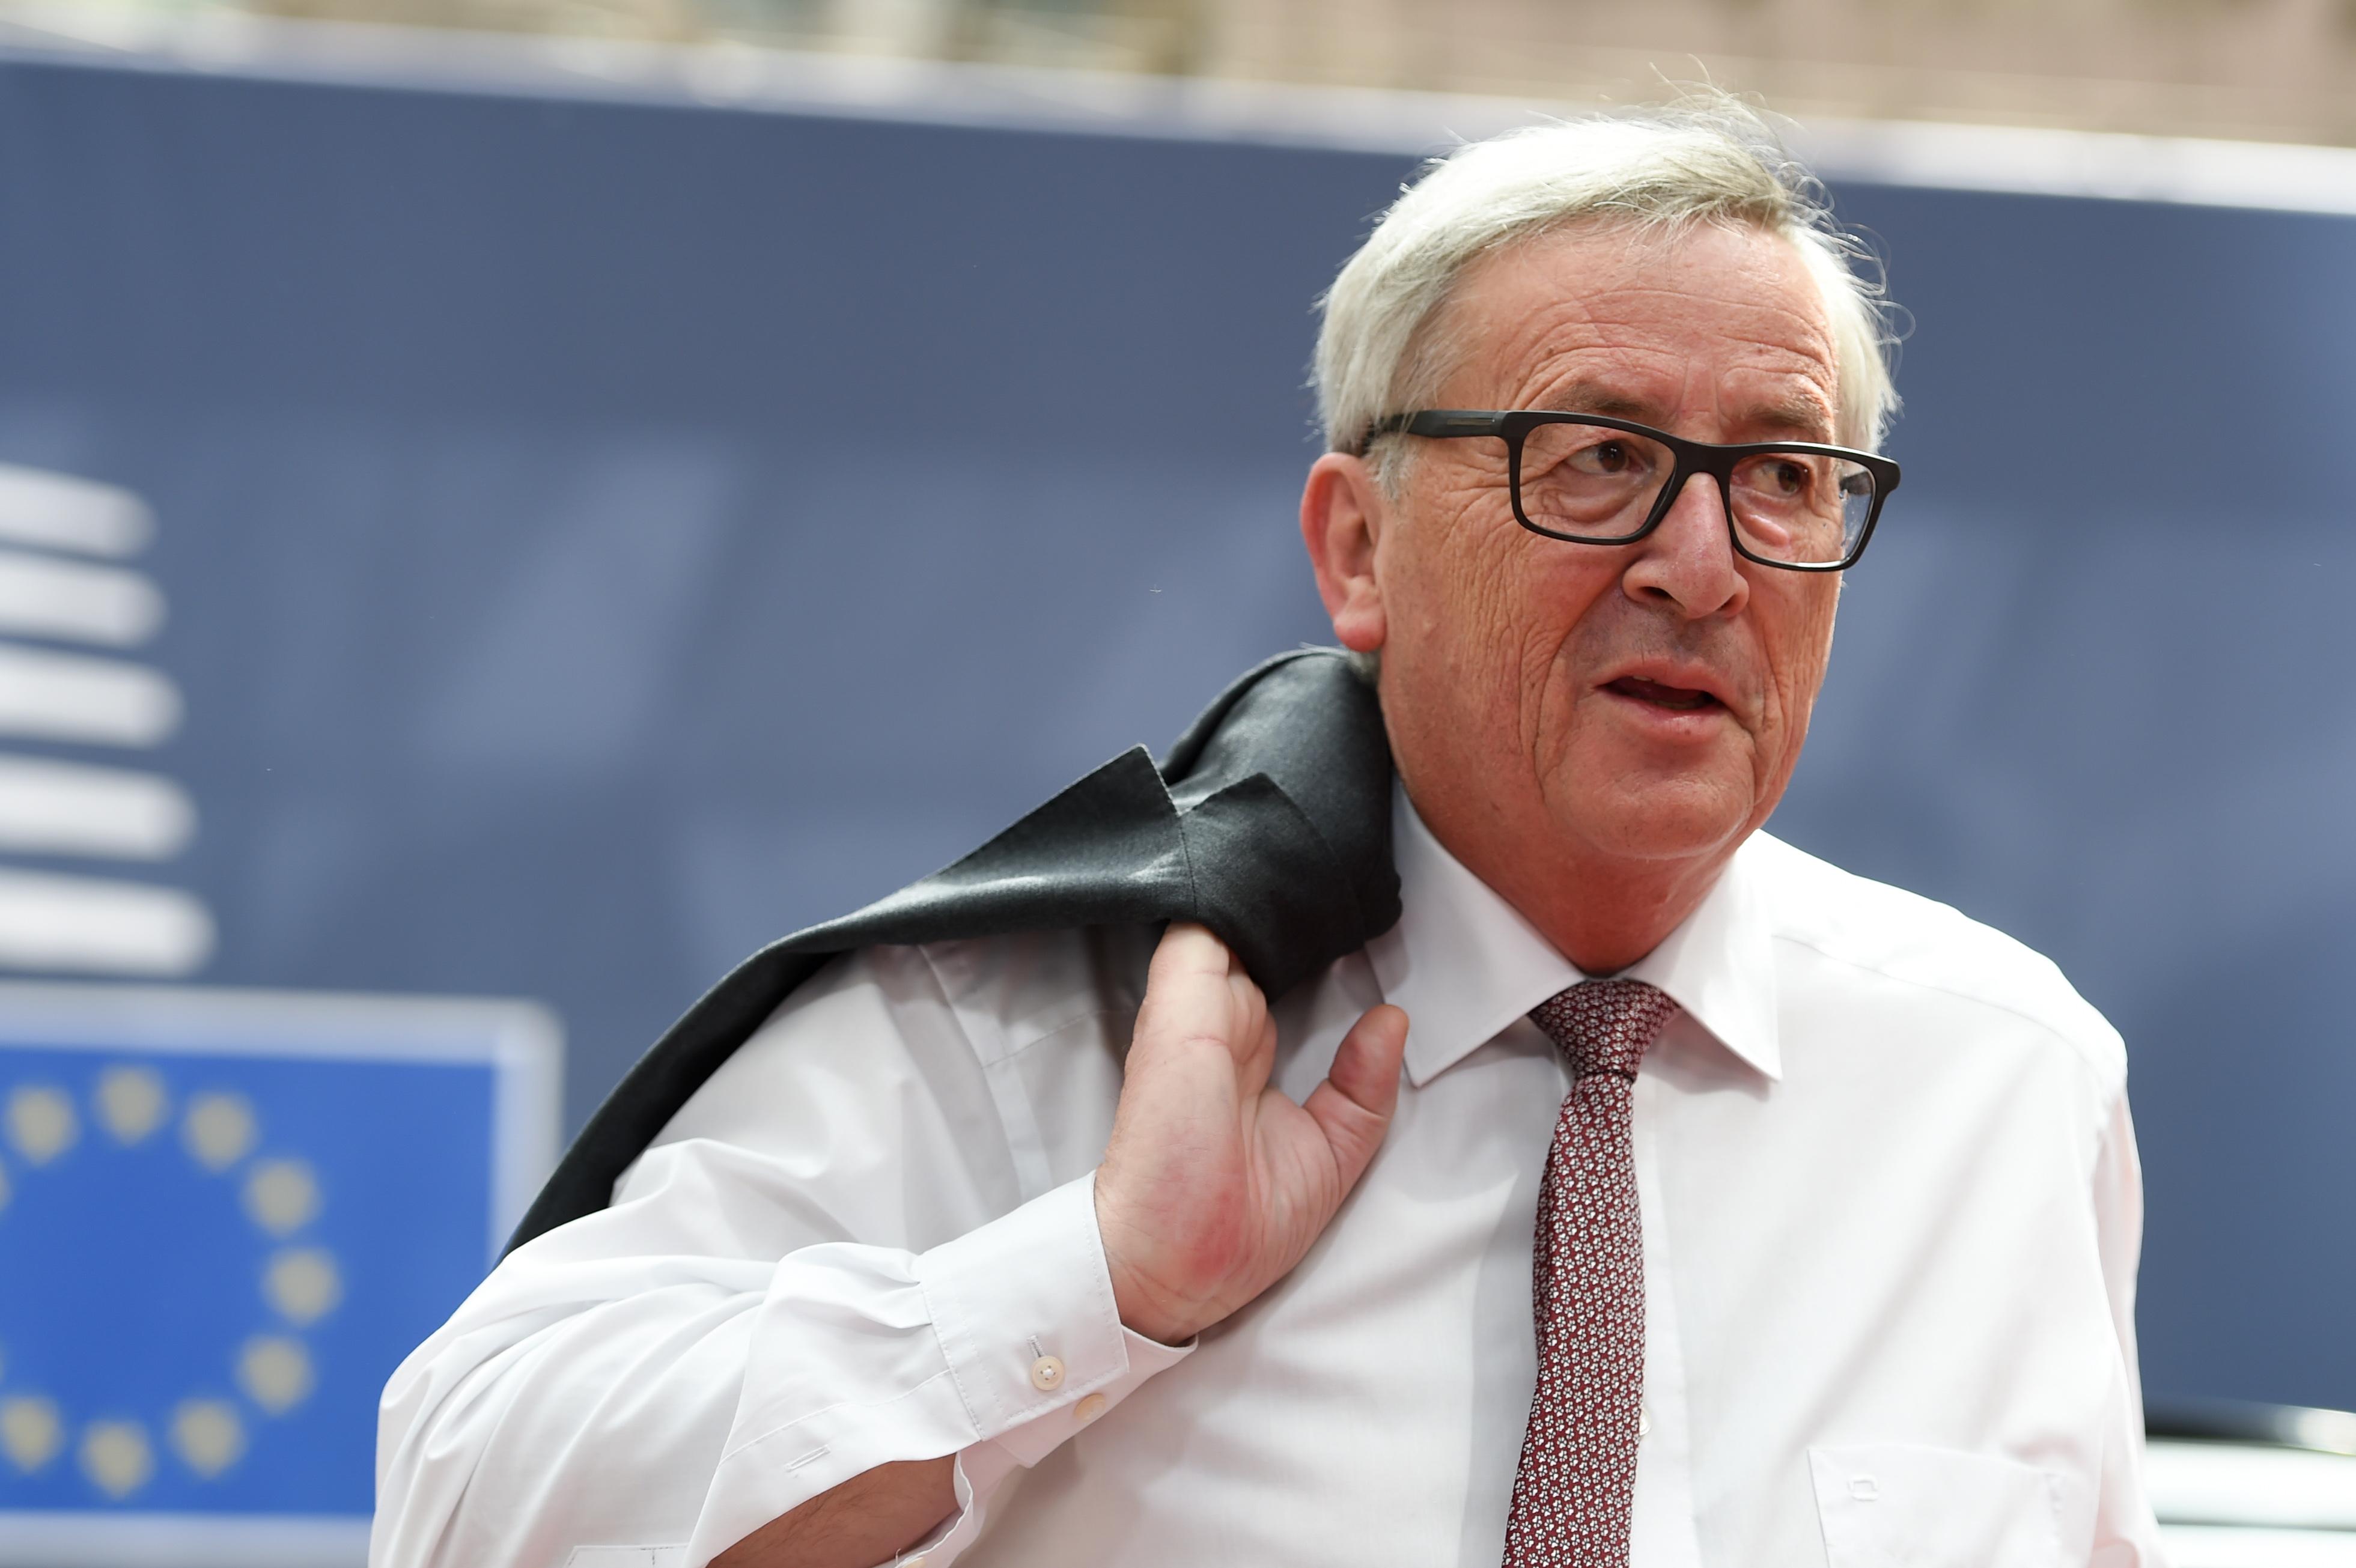 Juncker tells UK: No single market without freedom of movement – EURACTIV.com